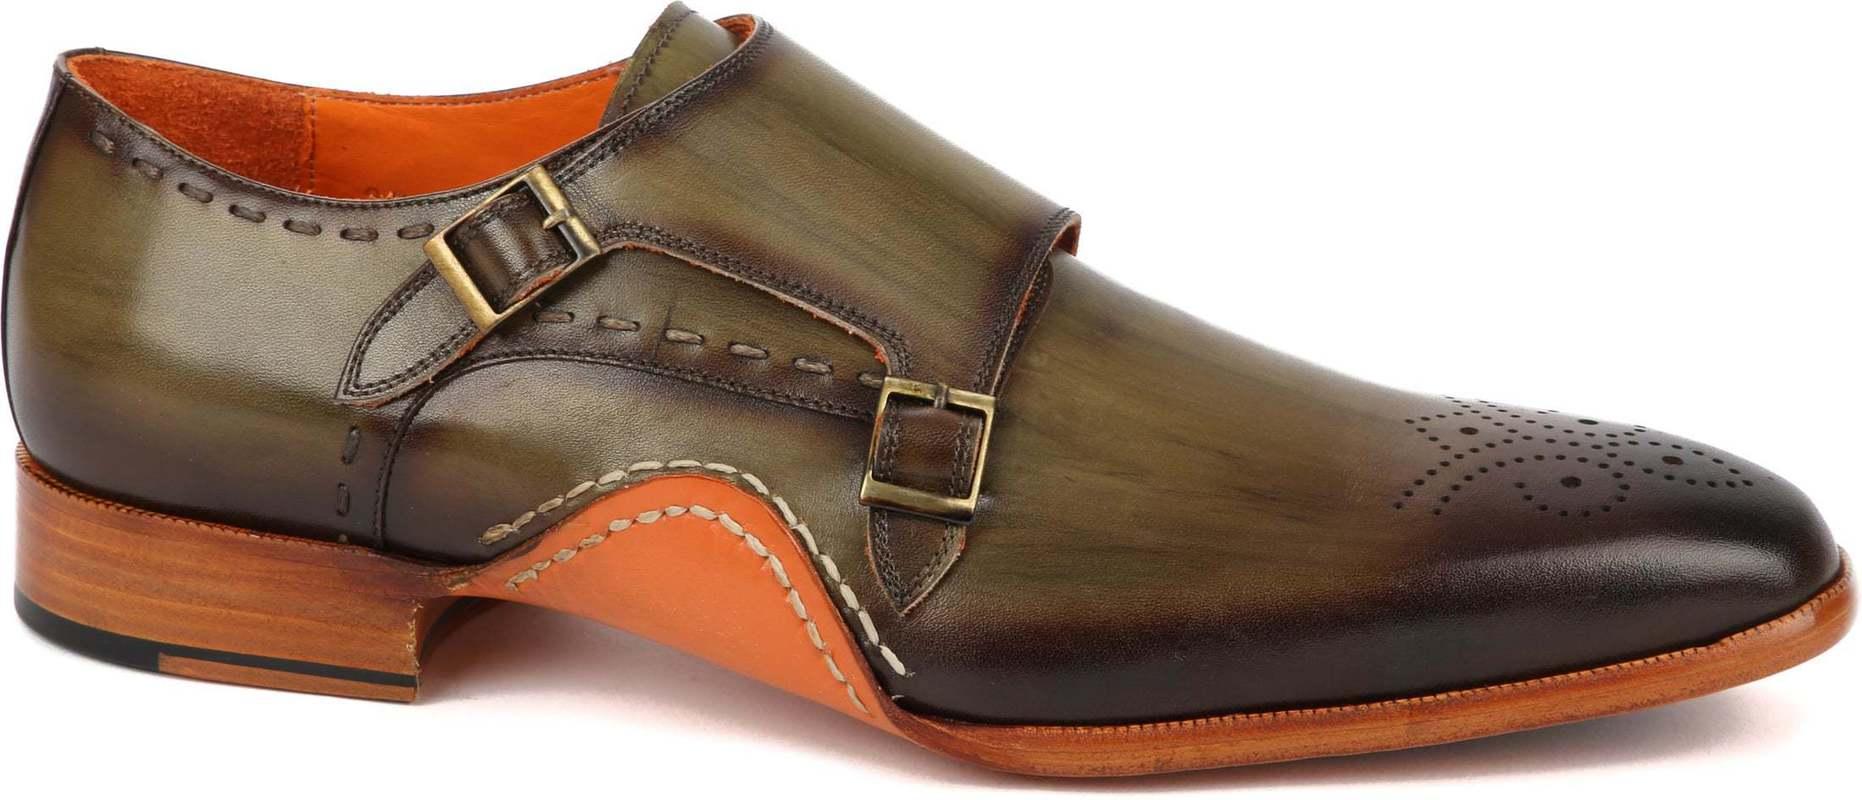 Melik Double Monk Strap Shoe Drago Green photo 0